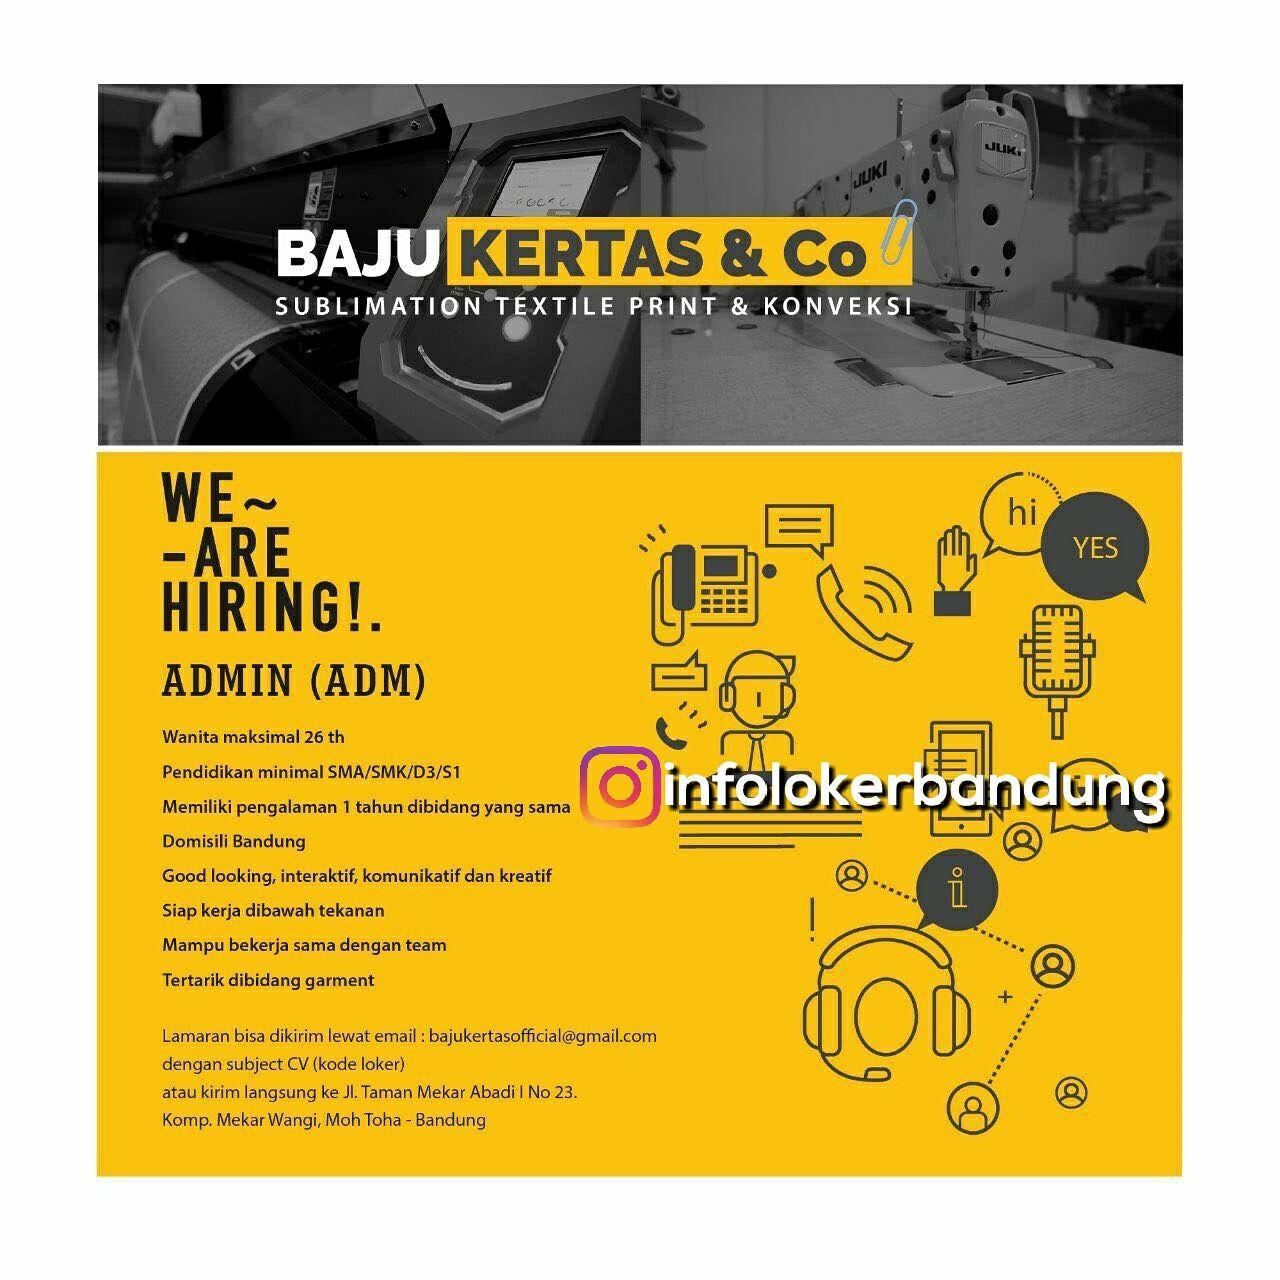 Lowongan Kerja Baju Kertas & Co Bandung Februari 2018